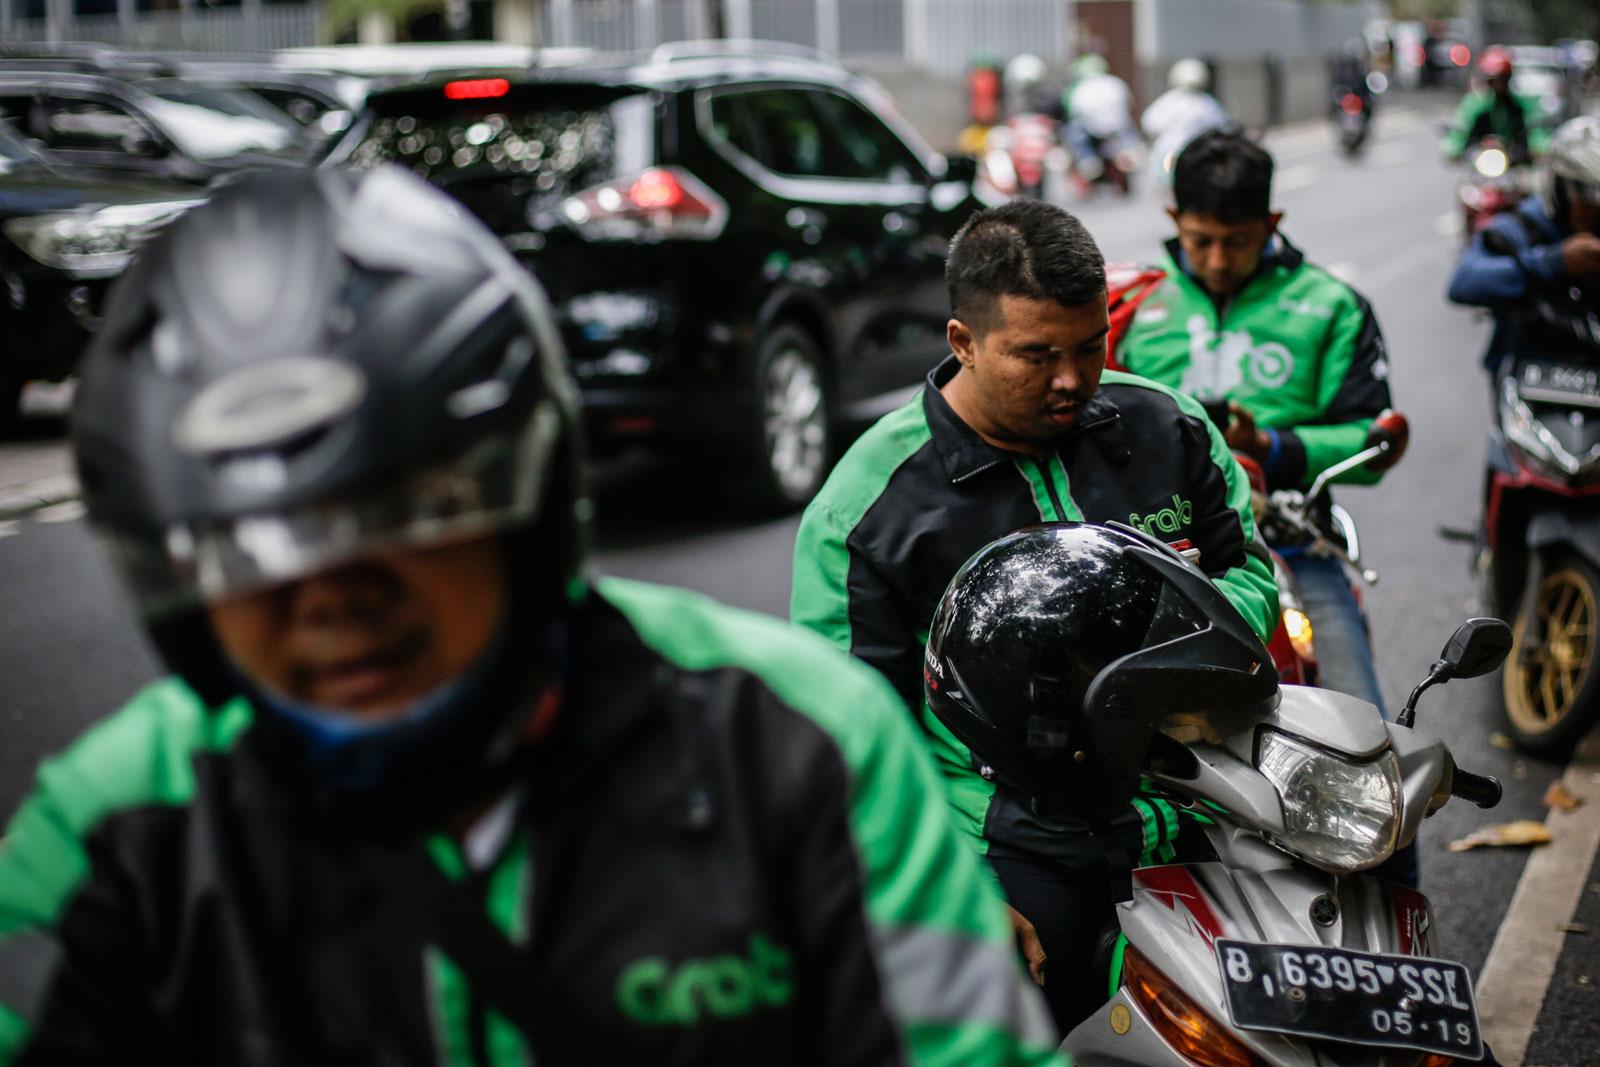 Gojek drivers seen in Jakarta in December 2017. Photo: EPA/Mast Irham